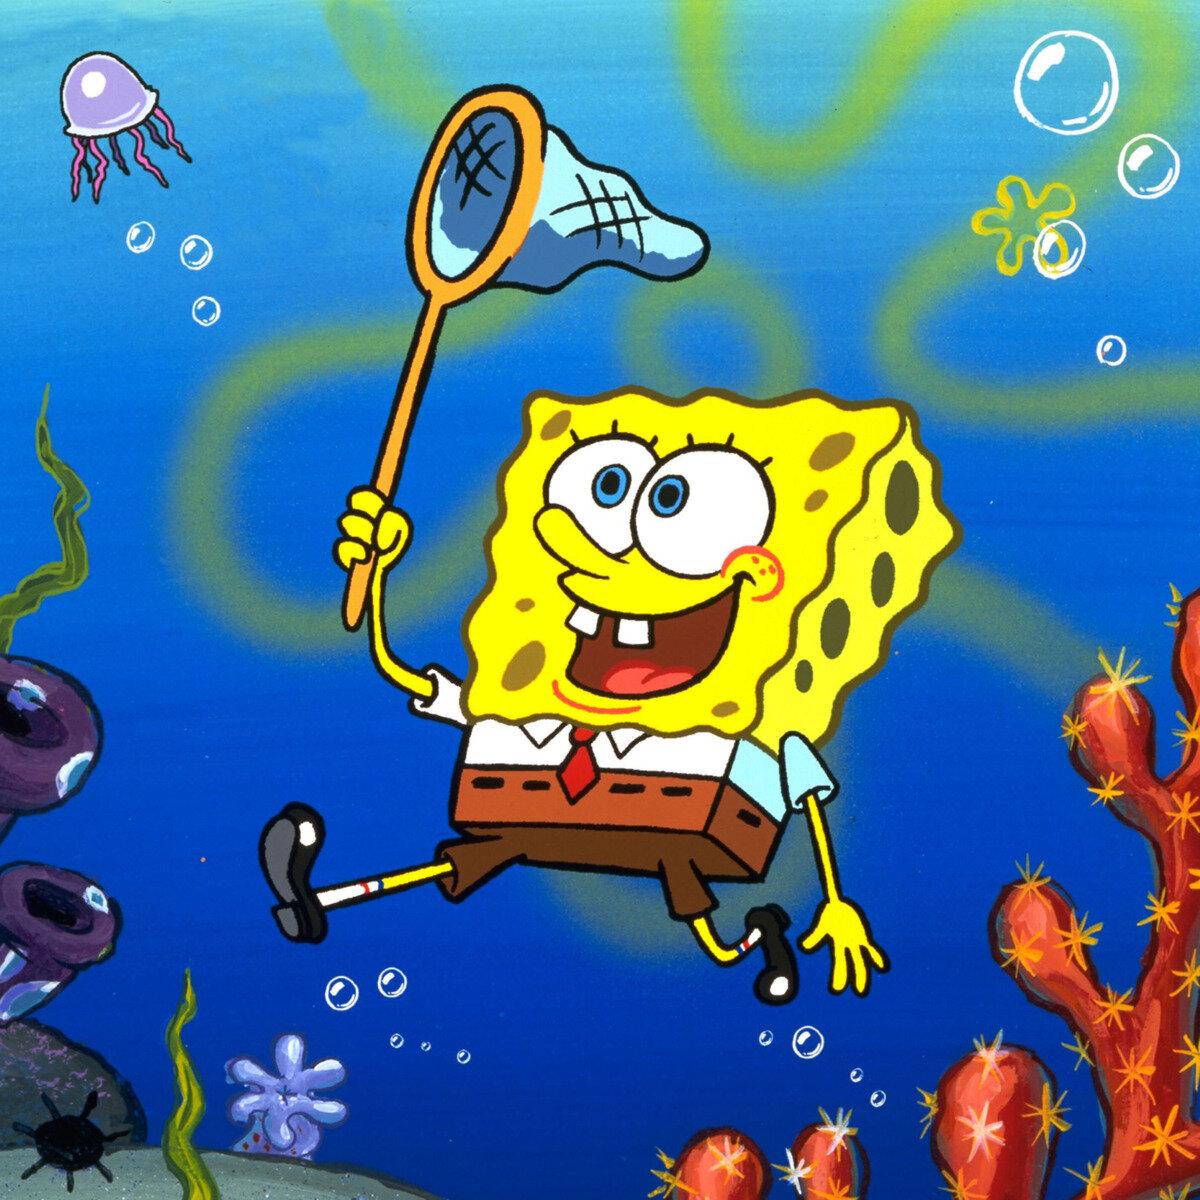 11-spongebob-squarepants.w1200.h1200.jpg